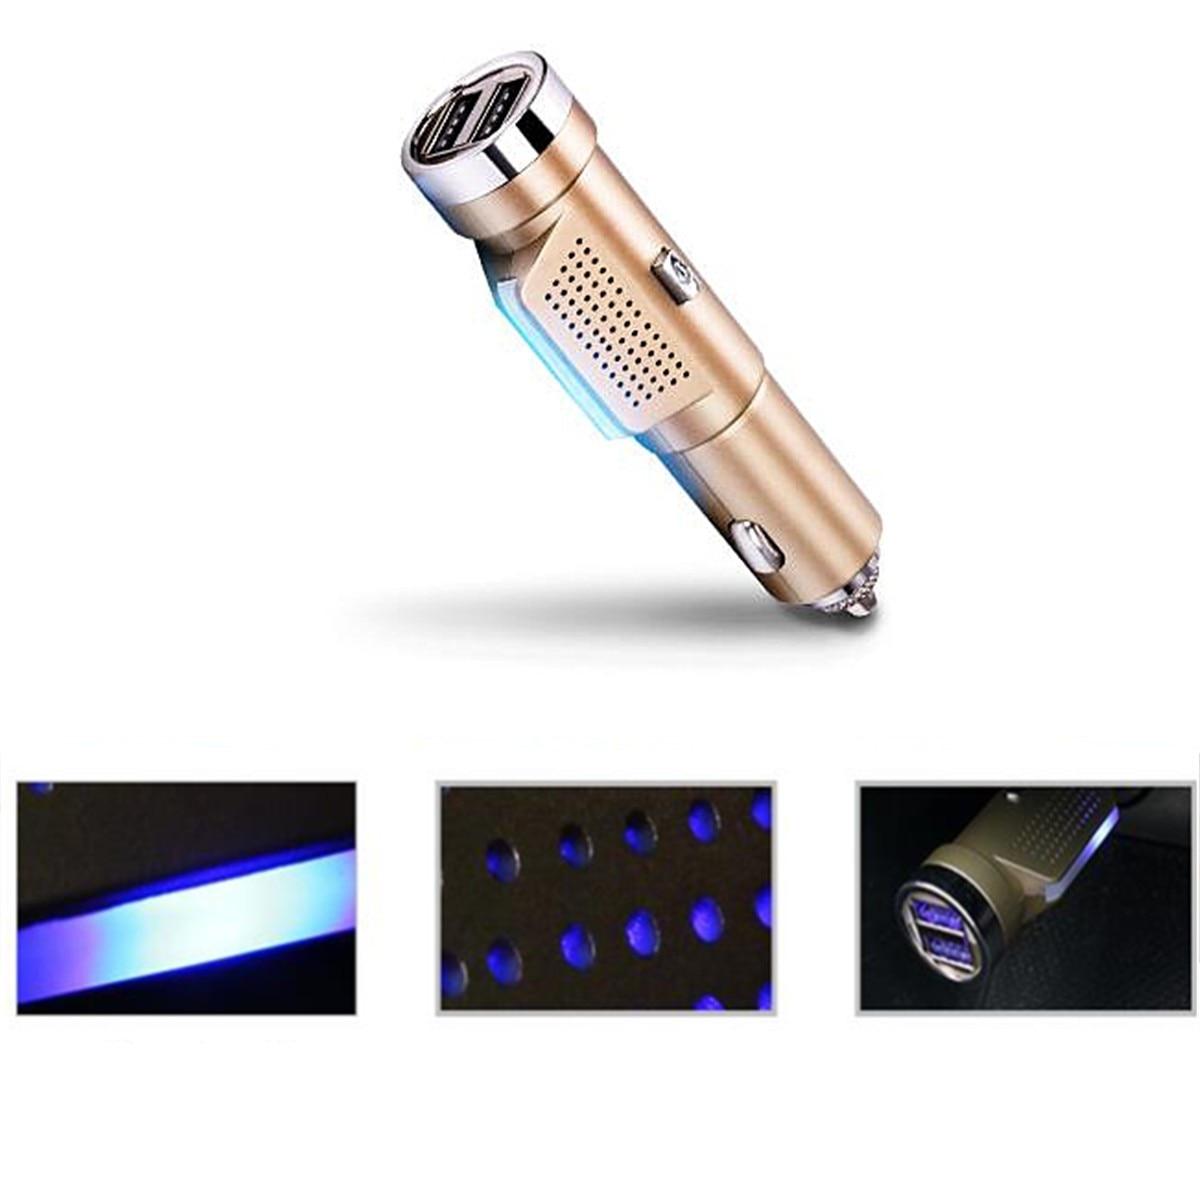 2 in 1 gold dual usb car charger fresh oxygen ozone air purifier cigarette lighter 12 24 v in. Black Bedroom Furniture Sets. Home Design Ideas